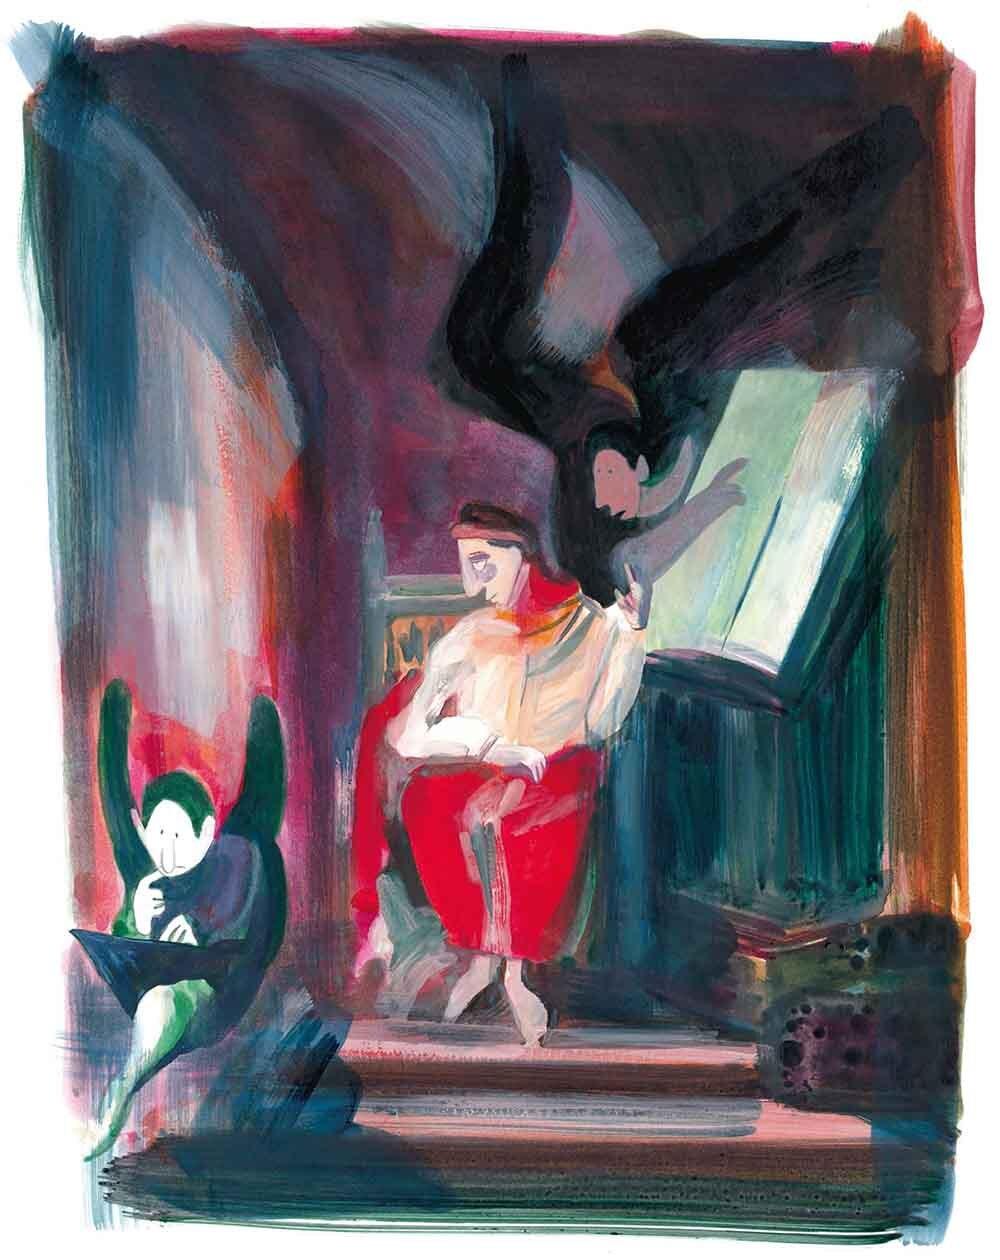 10 Catherine Meurisse Delacroix Dargaud 2019 Hintergrund bearbeitet